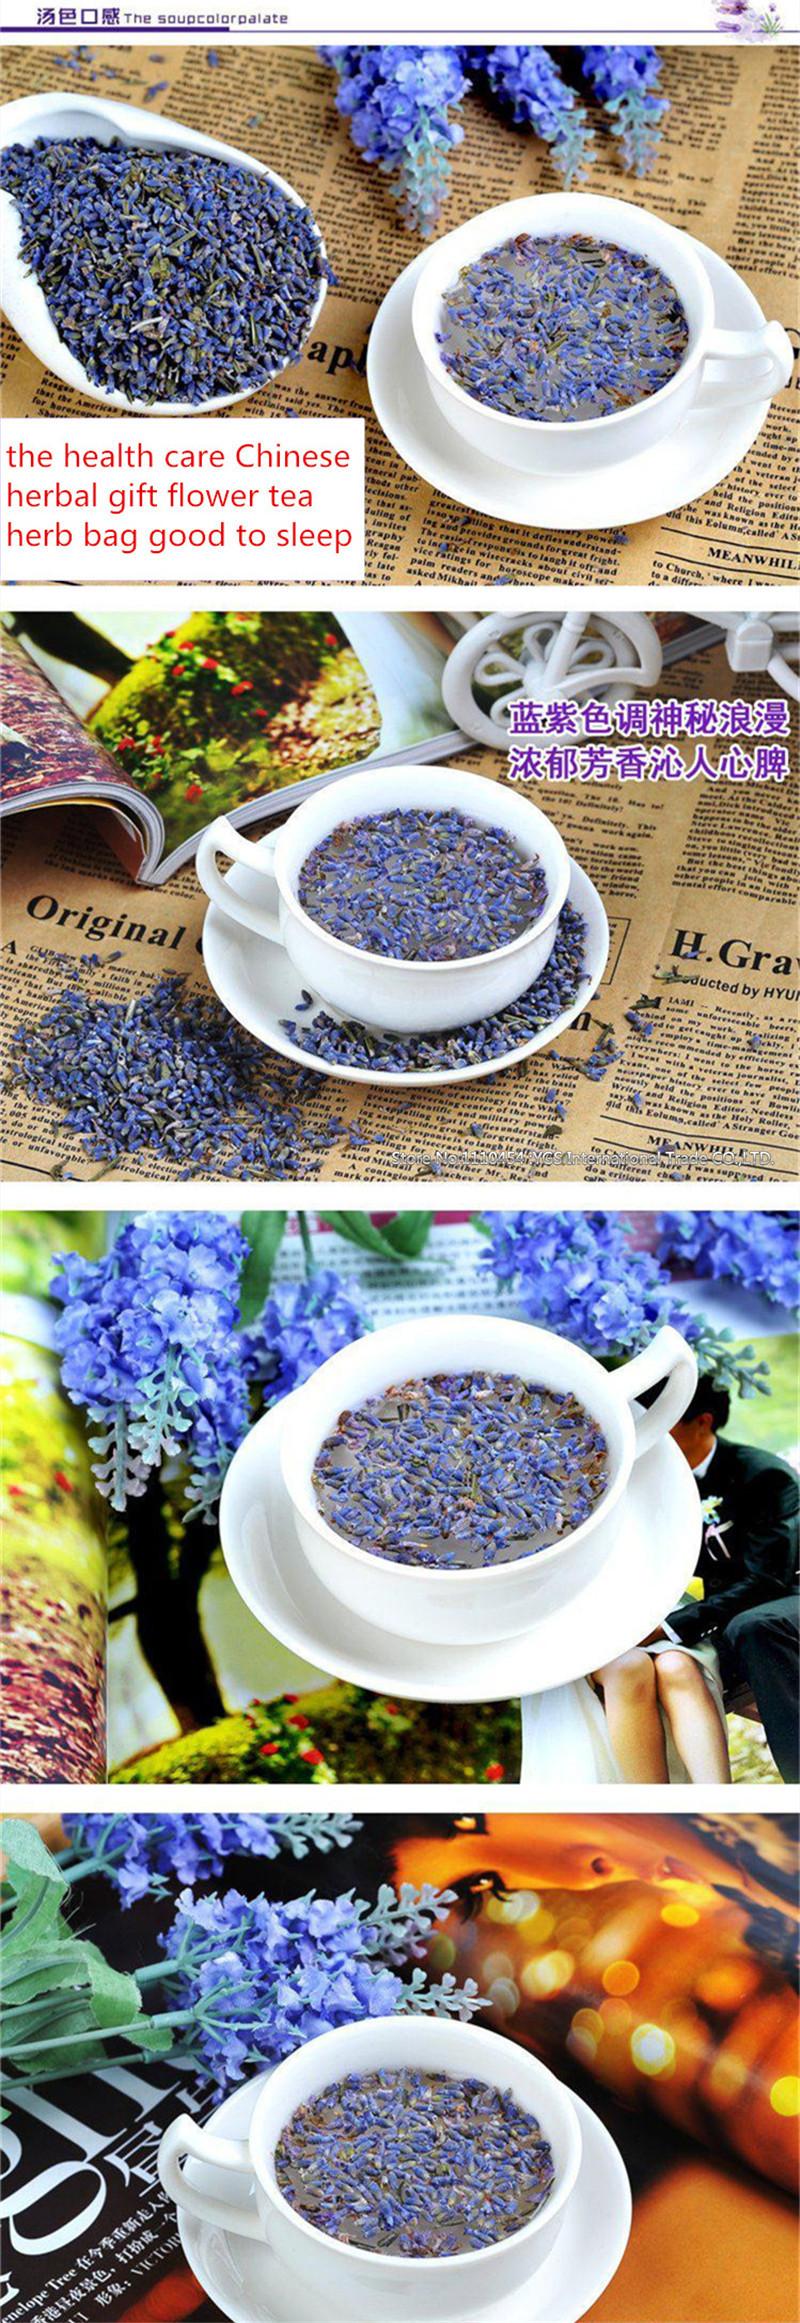 50g Lavender dried flower tea yangxinanshen sleeping the health care Chinese herbal gift flower tea herb bag good to sleep